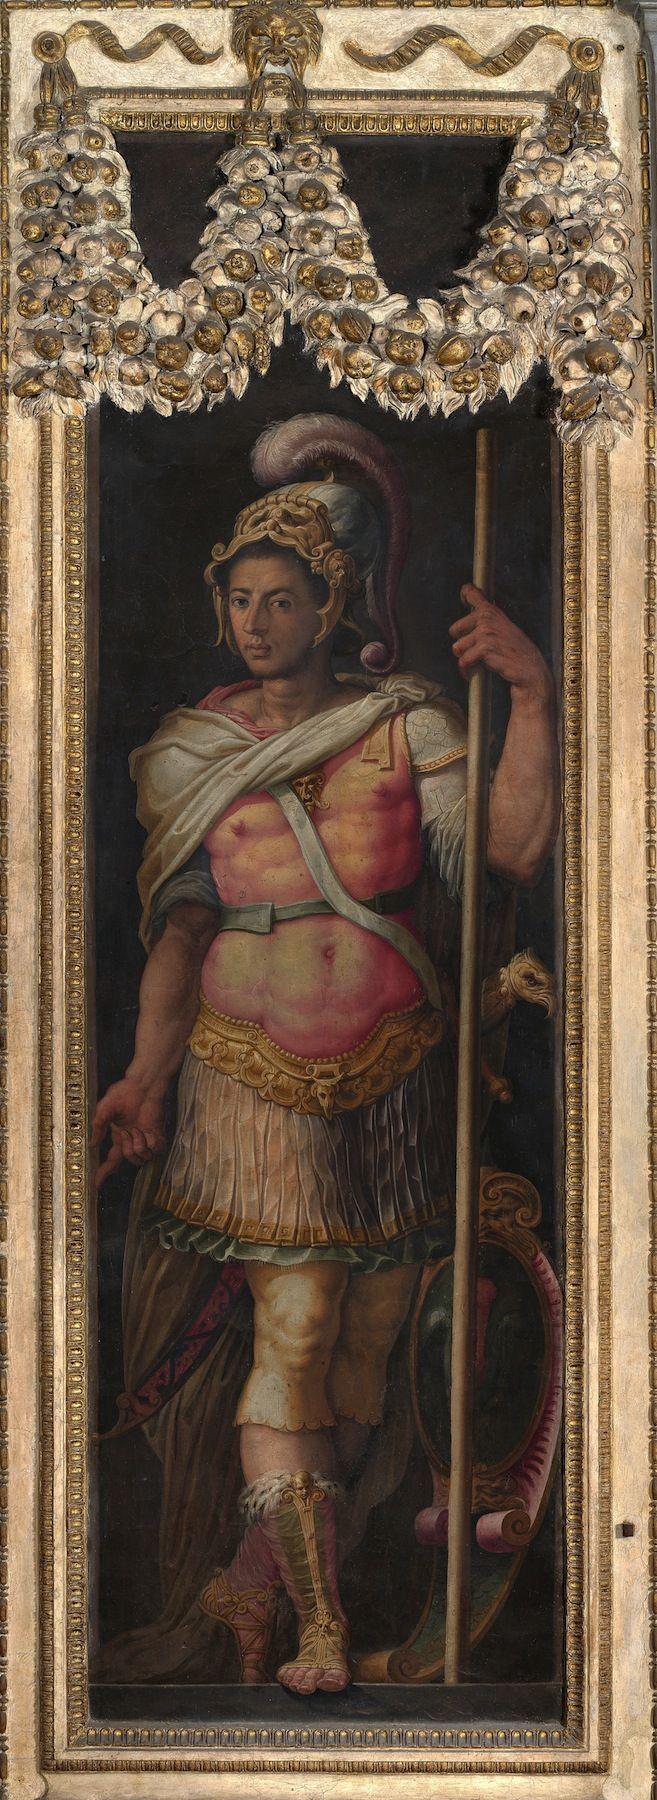 Giorgio Vasari Portrait of Alessandro de'Medici as Mars Italy (c. 1555) Fresco, 280 x 100 mm. Palazzo Vecchio Museum Alessandro de'Medici was the Duke of Florence 1530-37. His mother was Simonetta da...